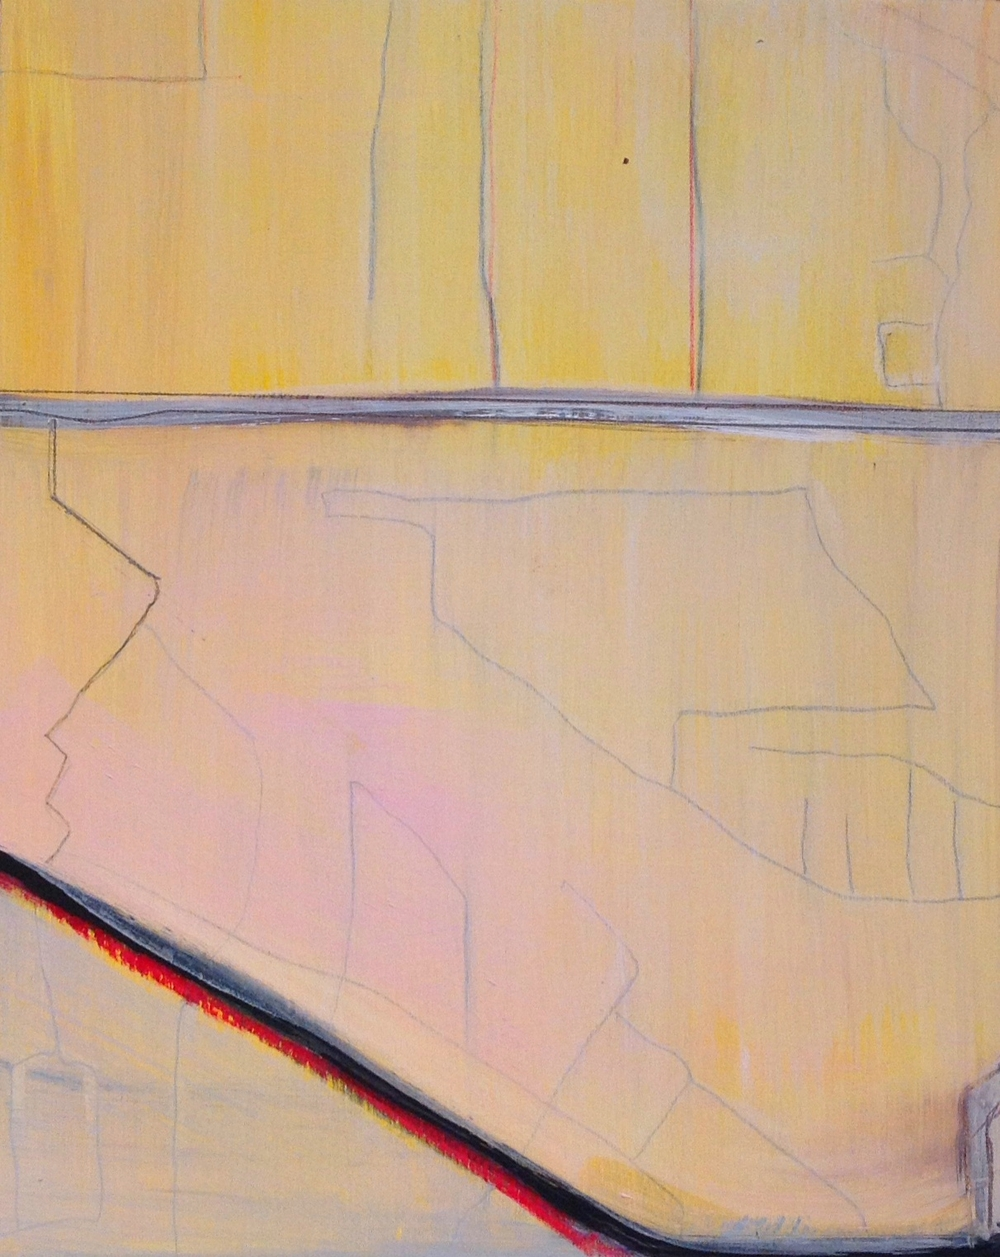 Artmap Section #12